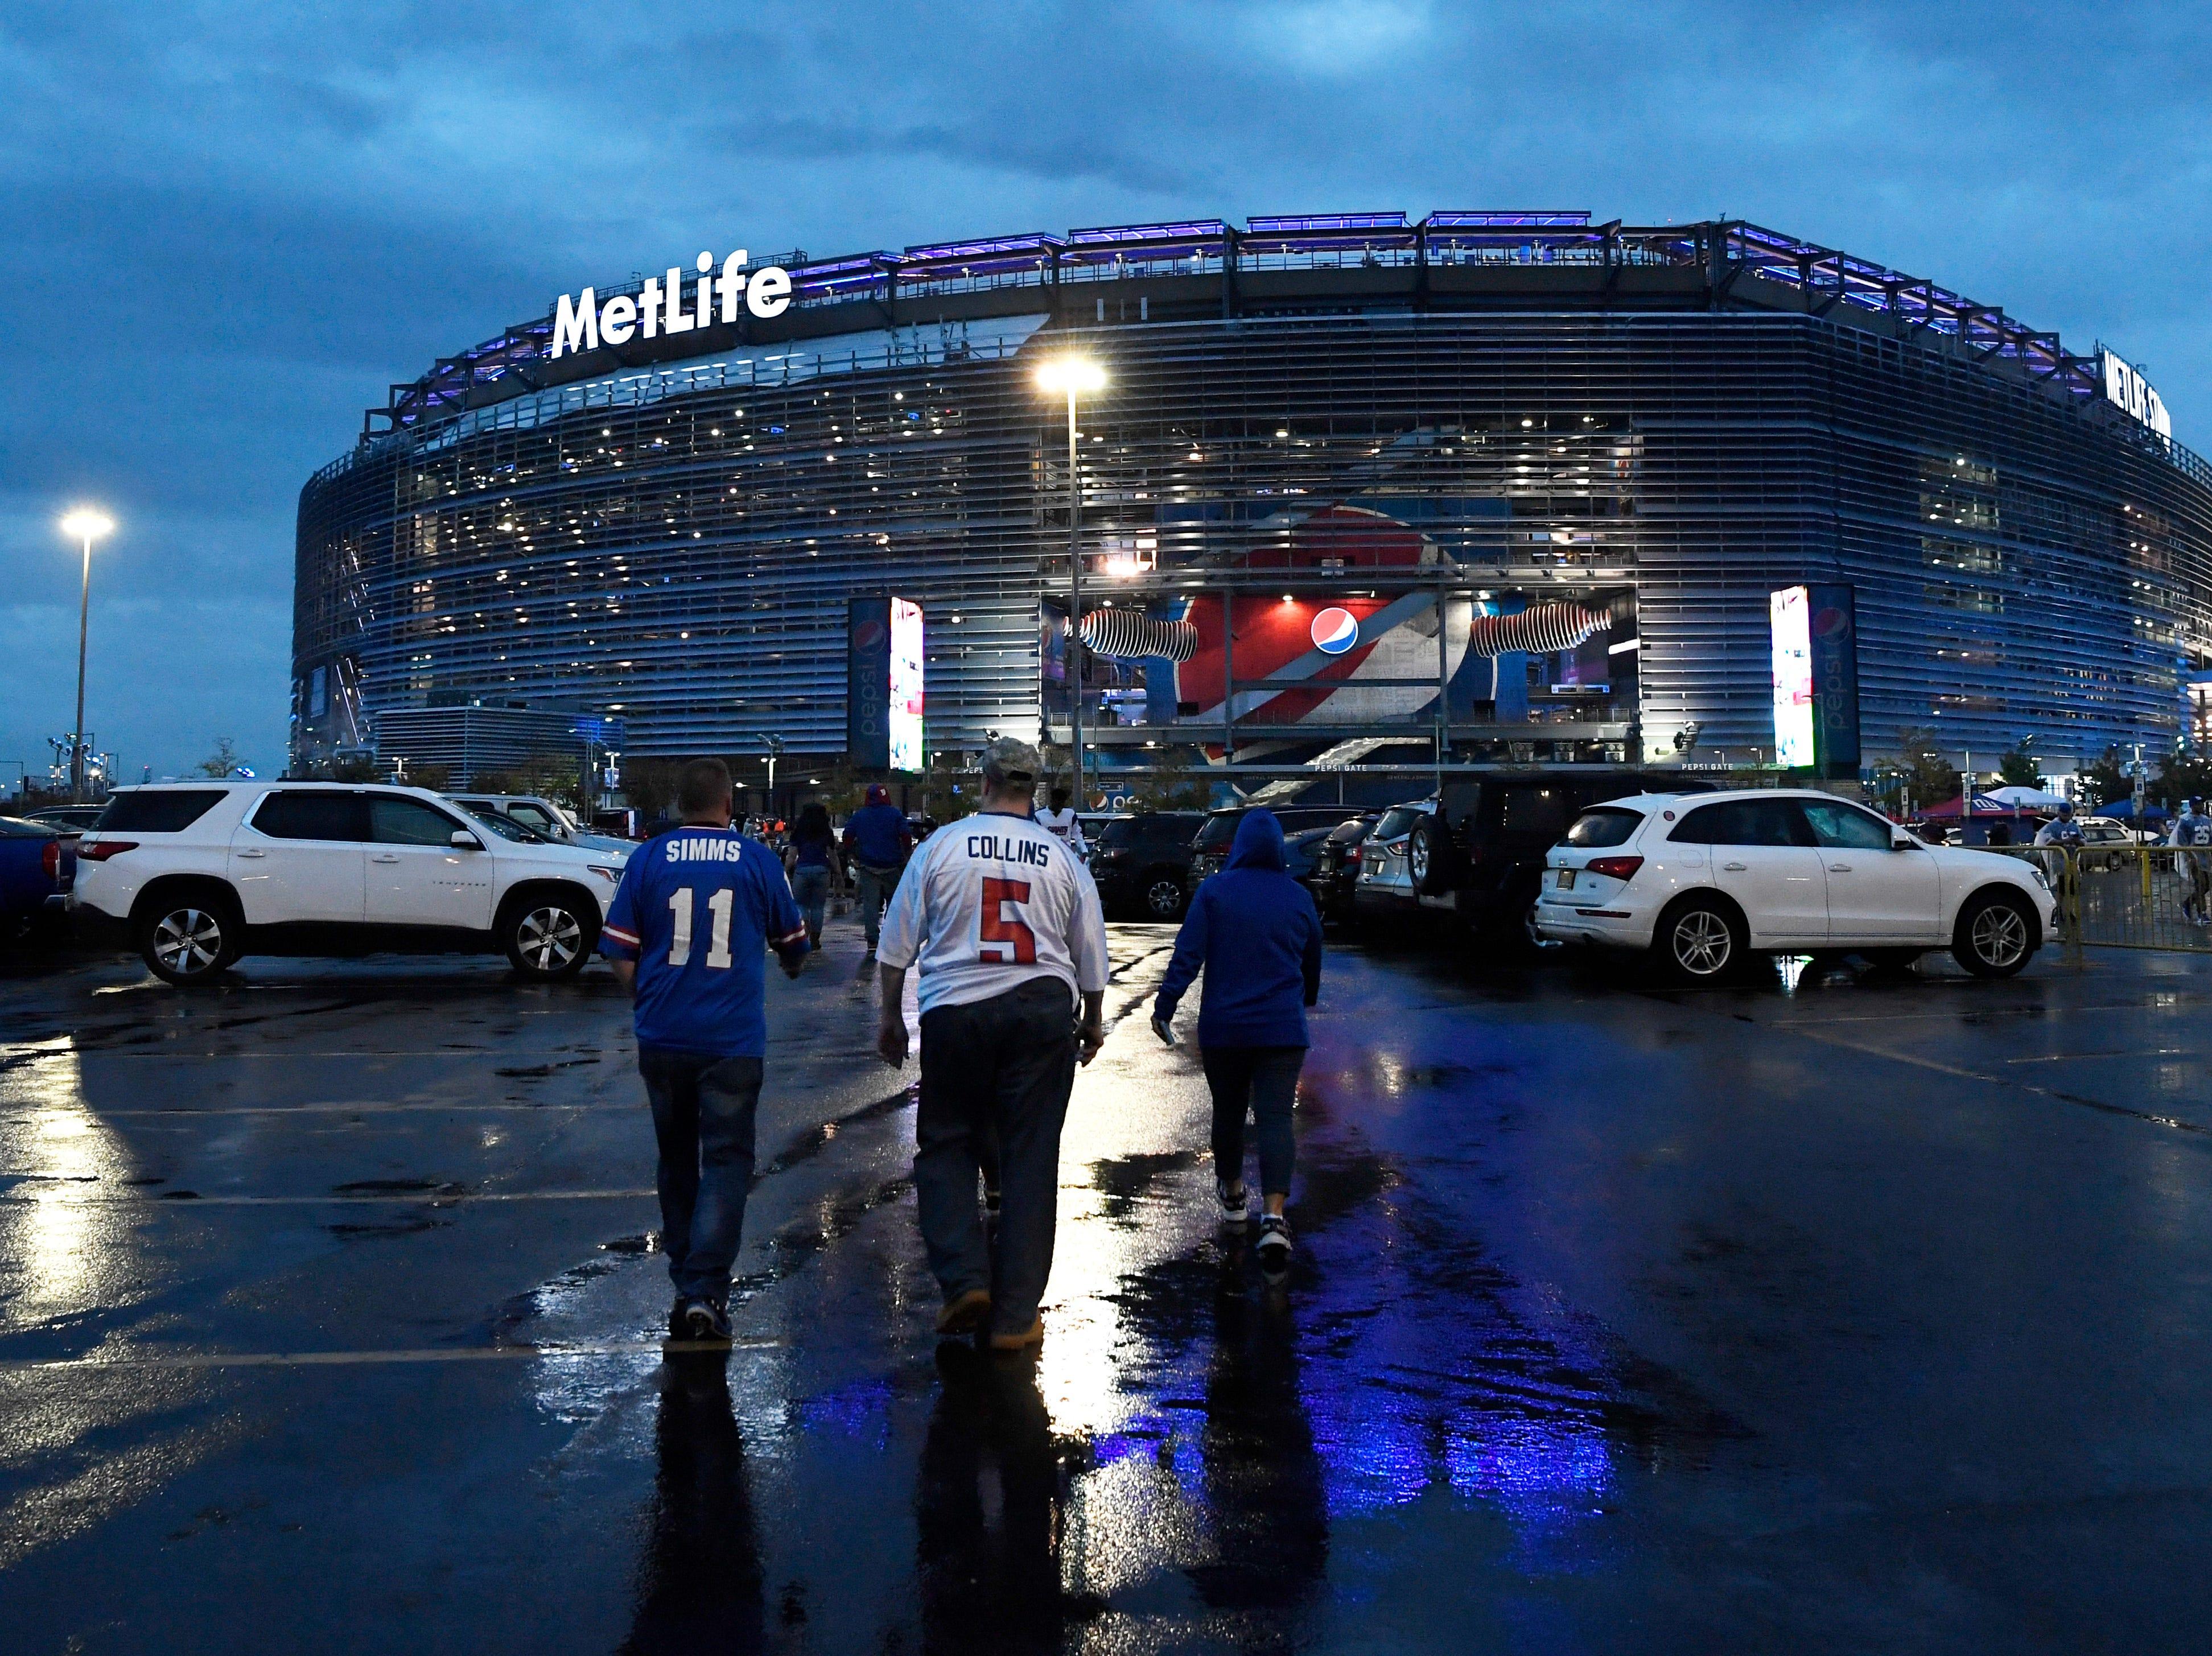 Fans walk across the rainy parking lot of MetLife Stadium before the New York Giants face the Philadelphia Eagles on Thursday, Oct. 11, 2018.